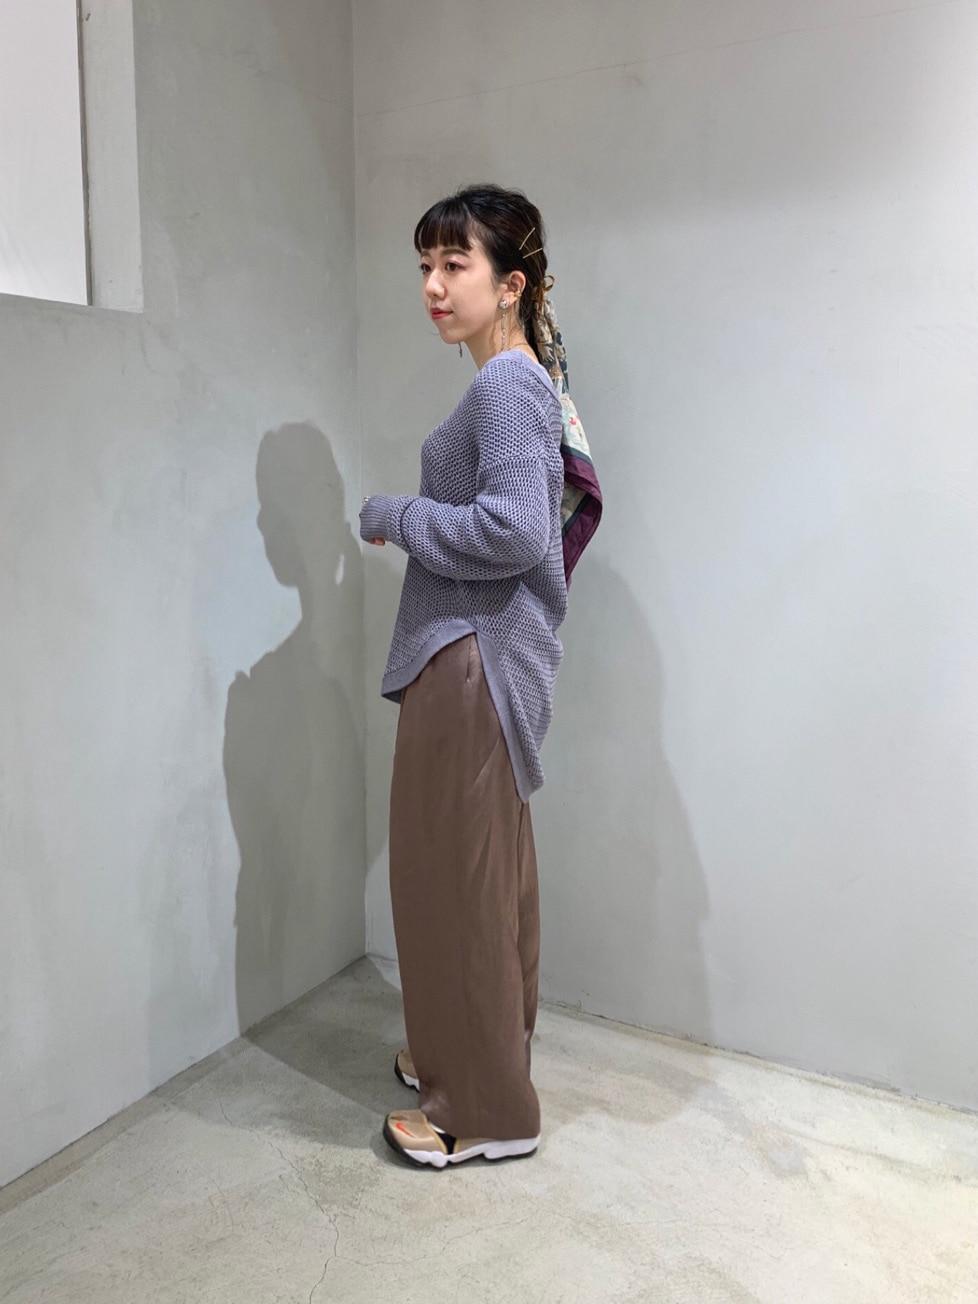 note et silence. ルクア大阪 身長:151cm 2020.03.09